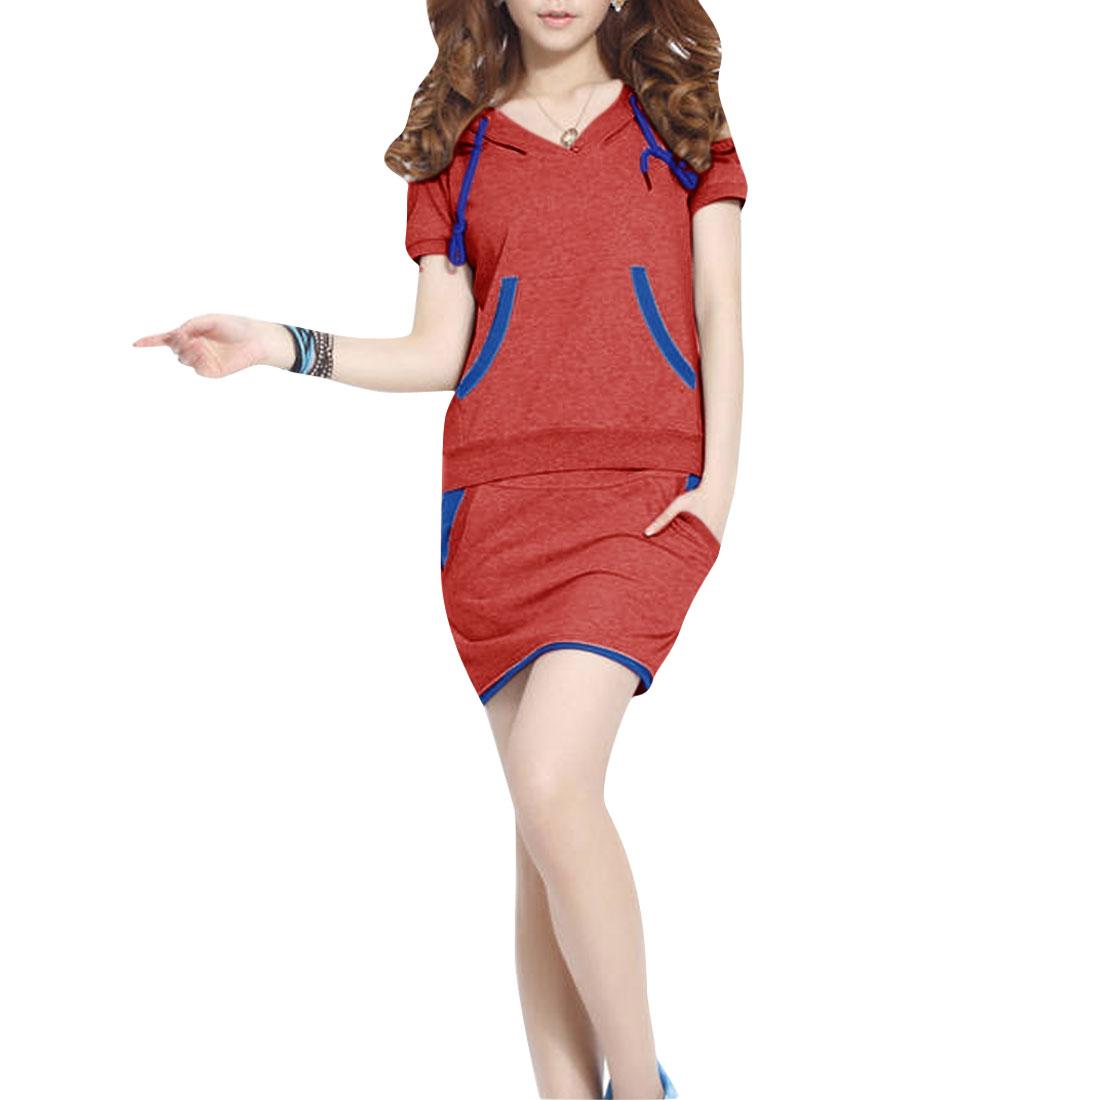 Women Short-sleeved Split Neck Tops w Color Contrast Skirt Watermelon Red S